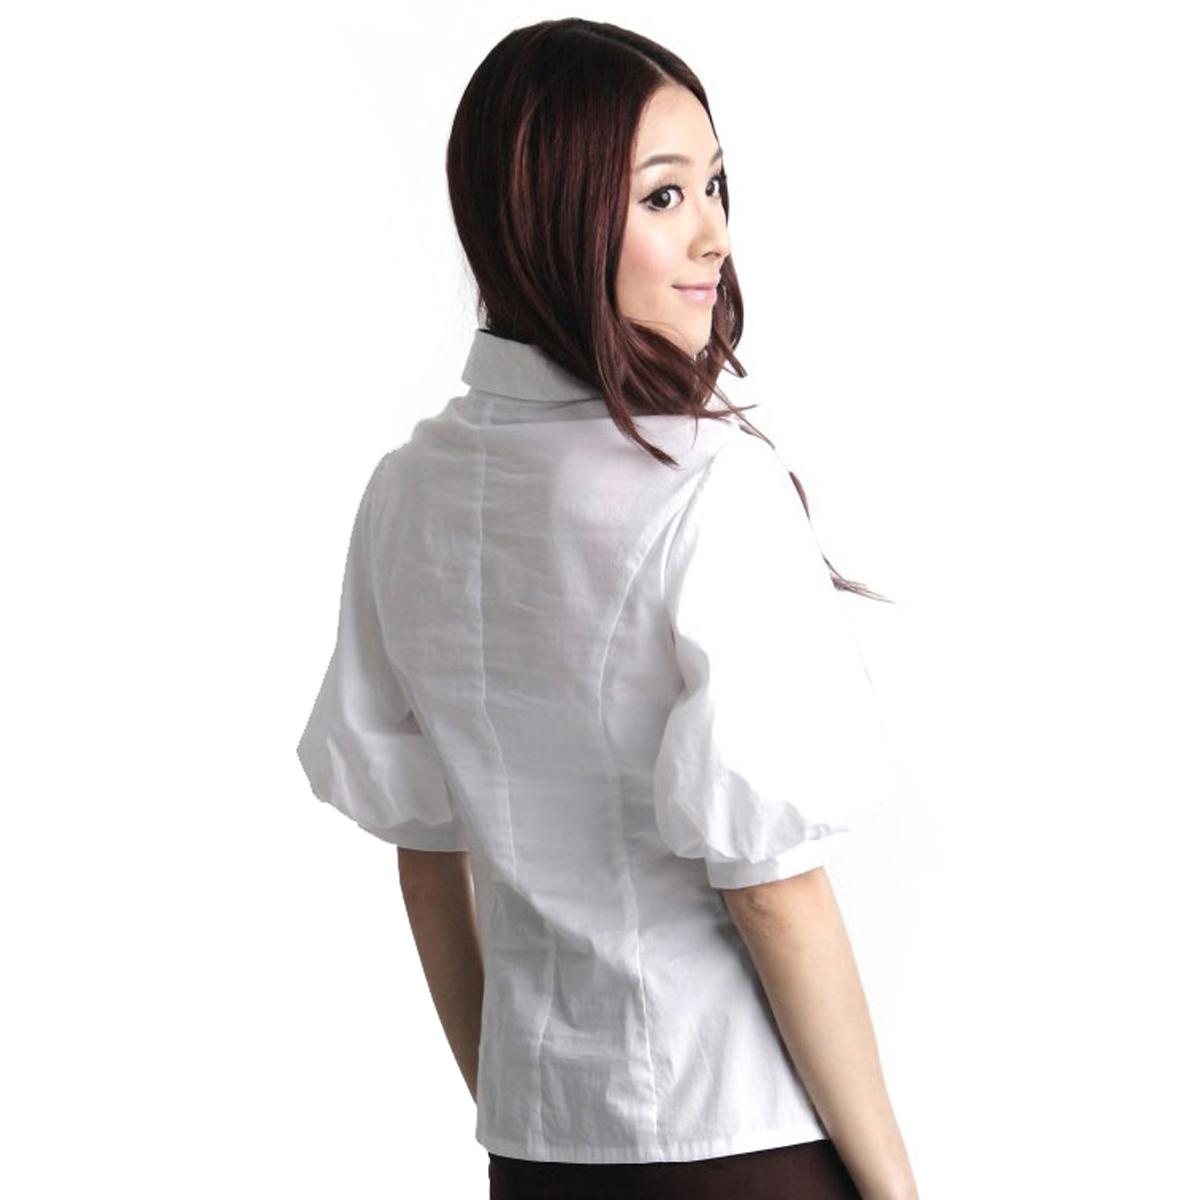 женская рубашка OSA sc00403 O.SA OL